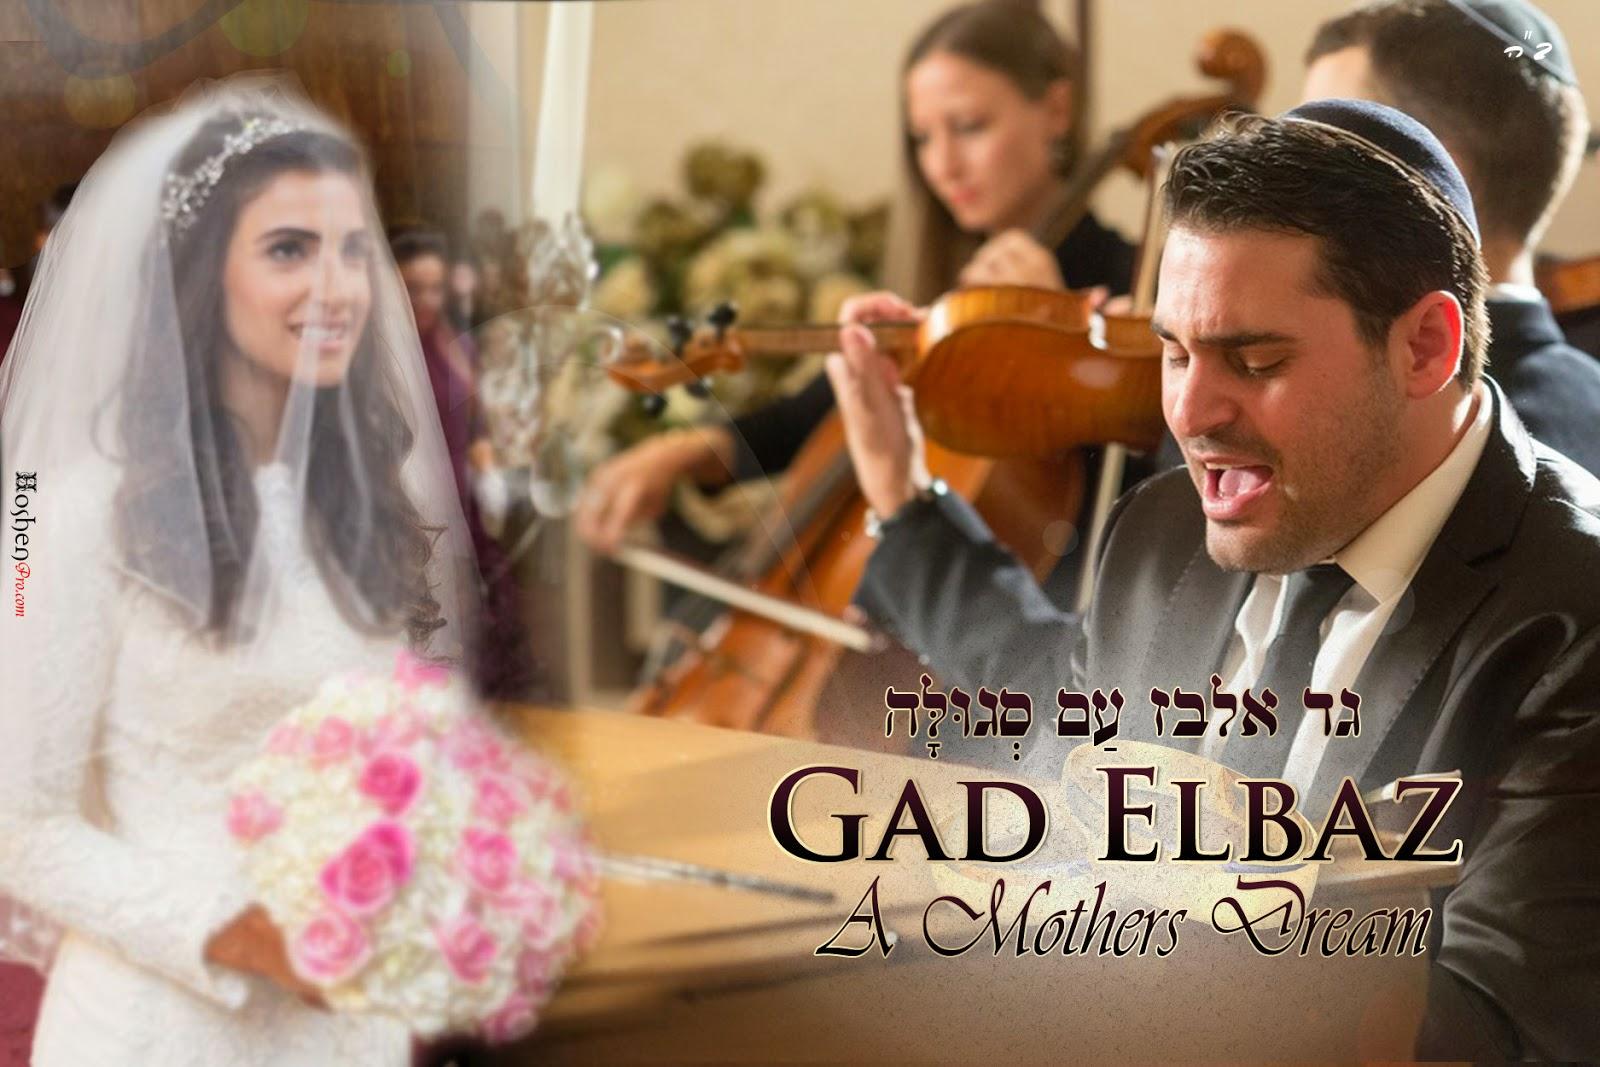 Gad Elbaz - A Mother's Dream